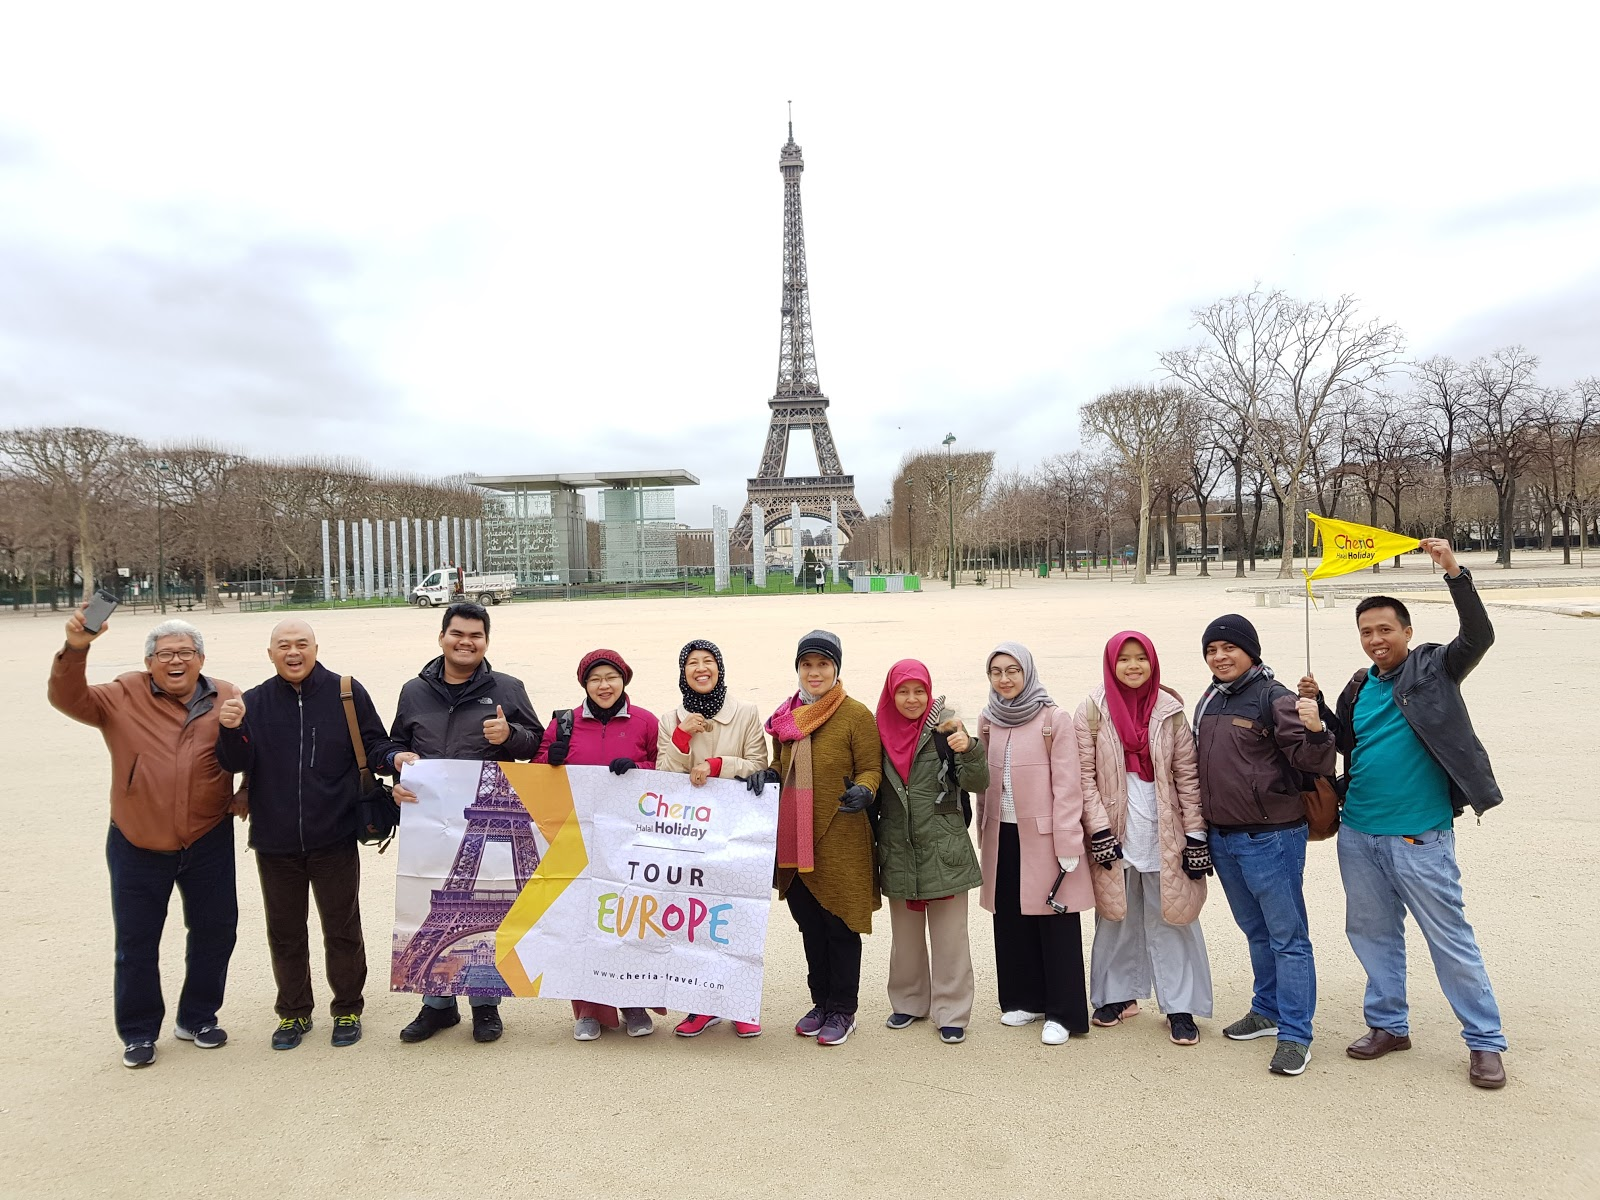 Paket Tour Eropa Muslim Friendly 2018 2019 Promo Cheria Holiday Wisata 3 Negara